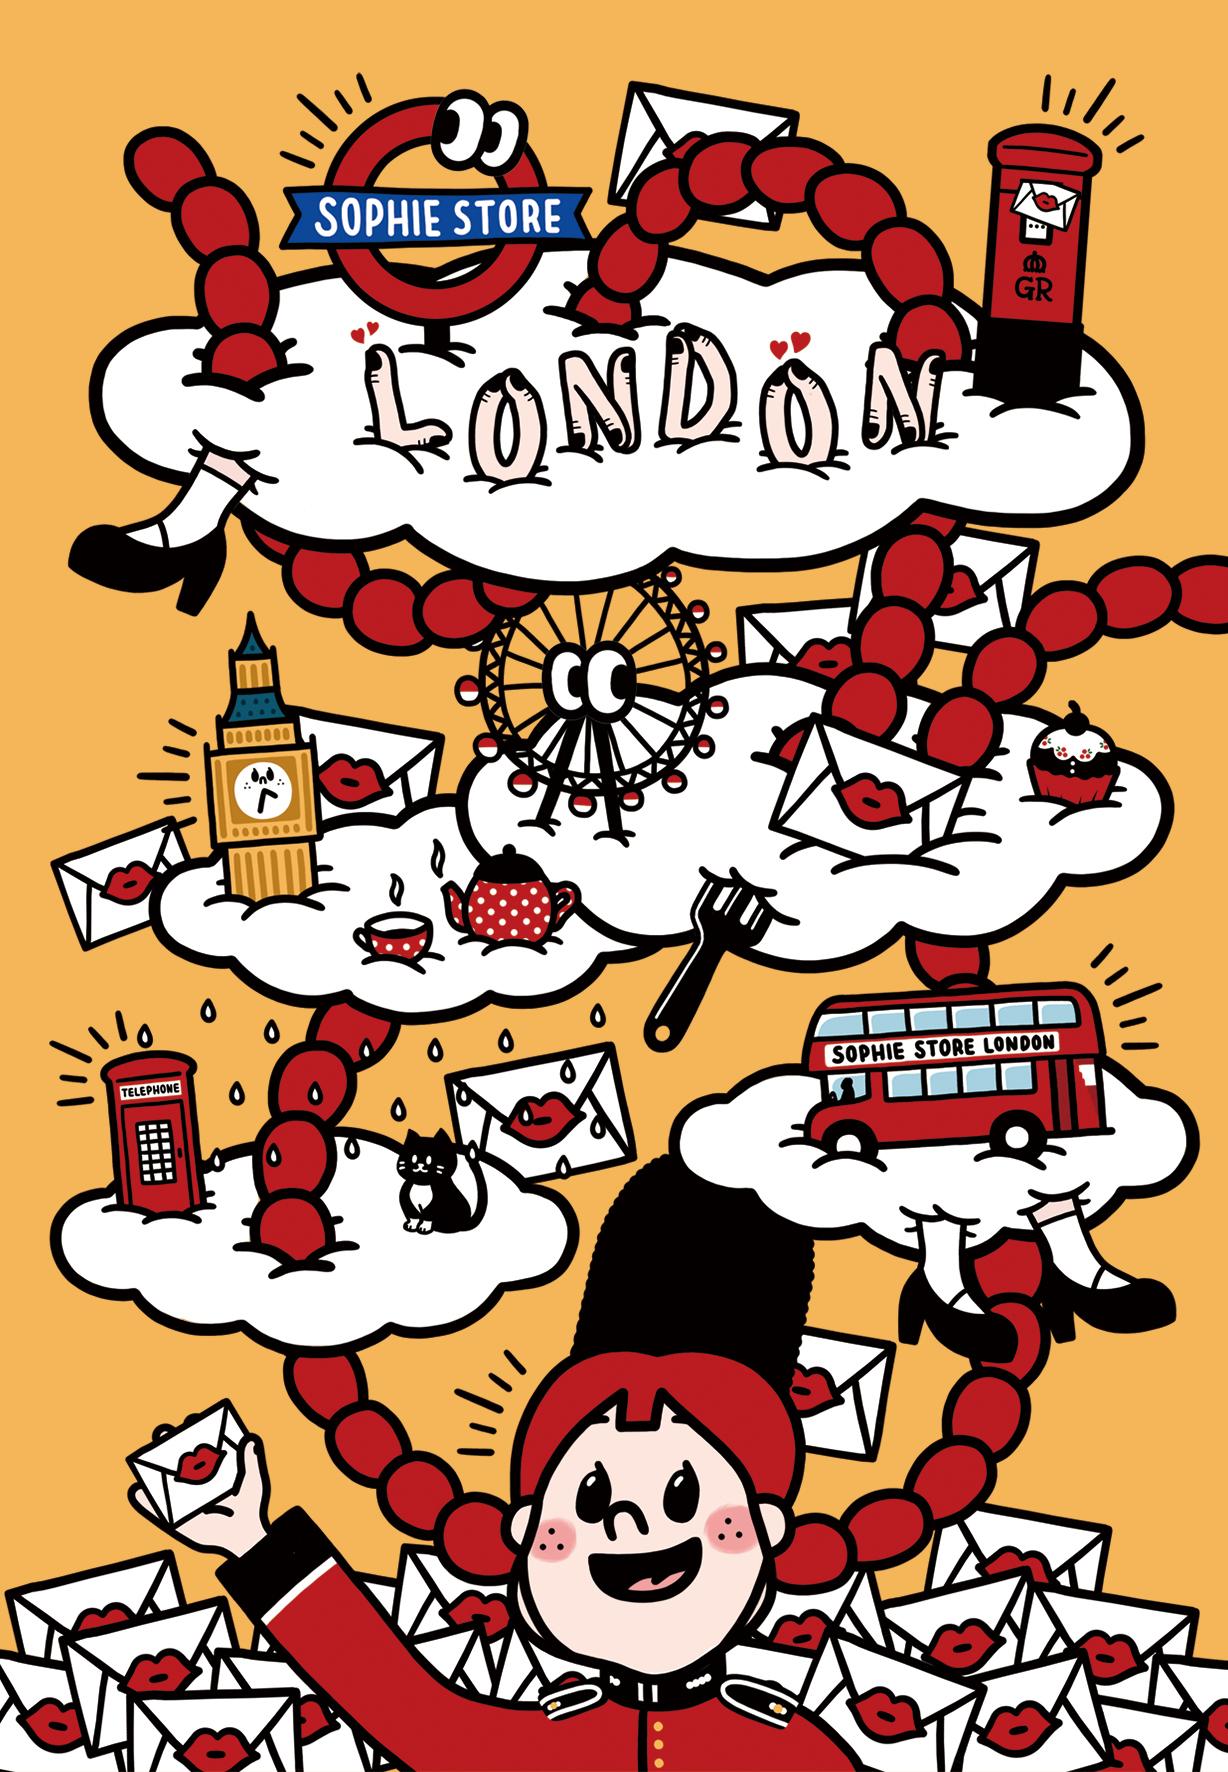 7_Londonsky.jpg